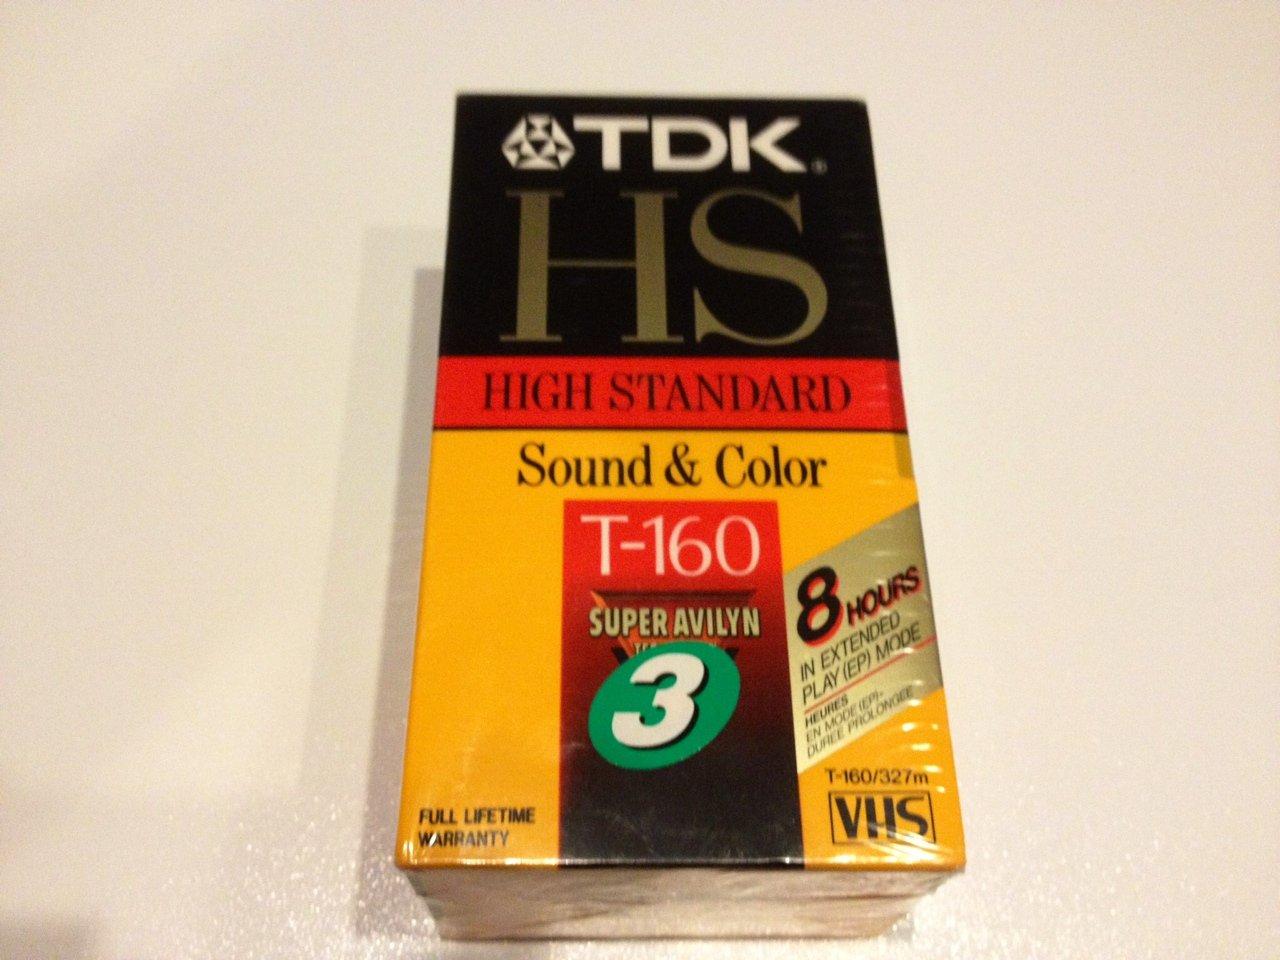 TDK HS T-160 High Standard Sound & Color VHS Video Cassette Tapes - Pack of 3